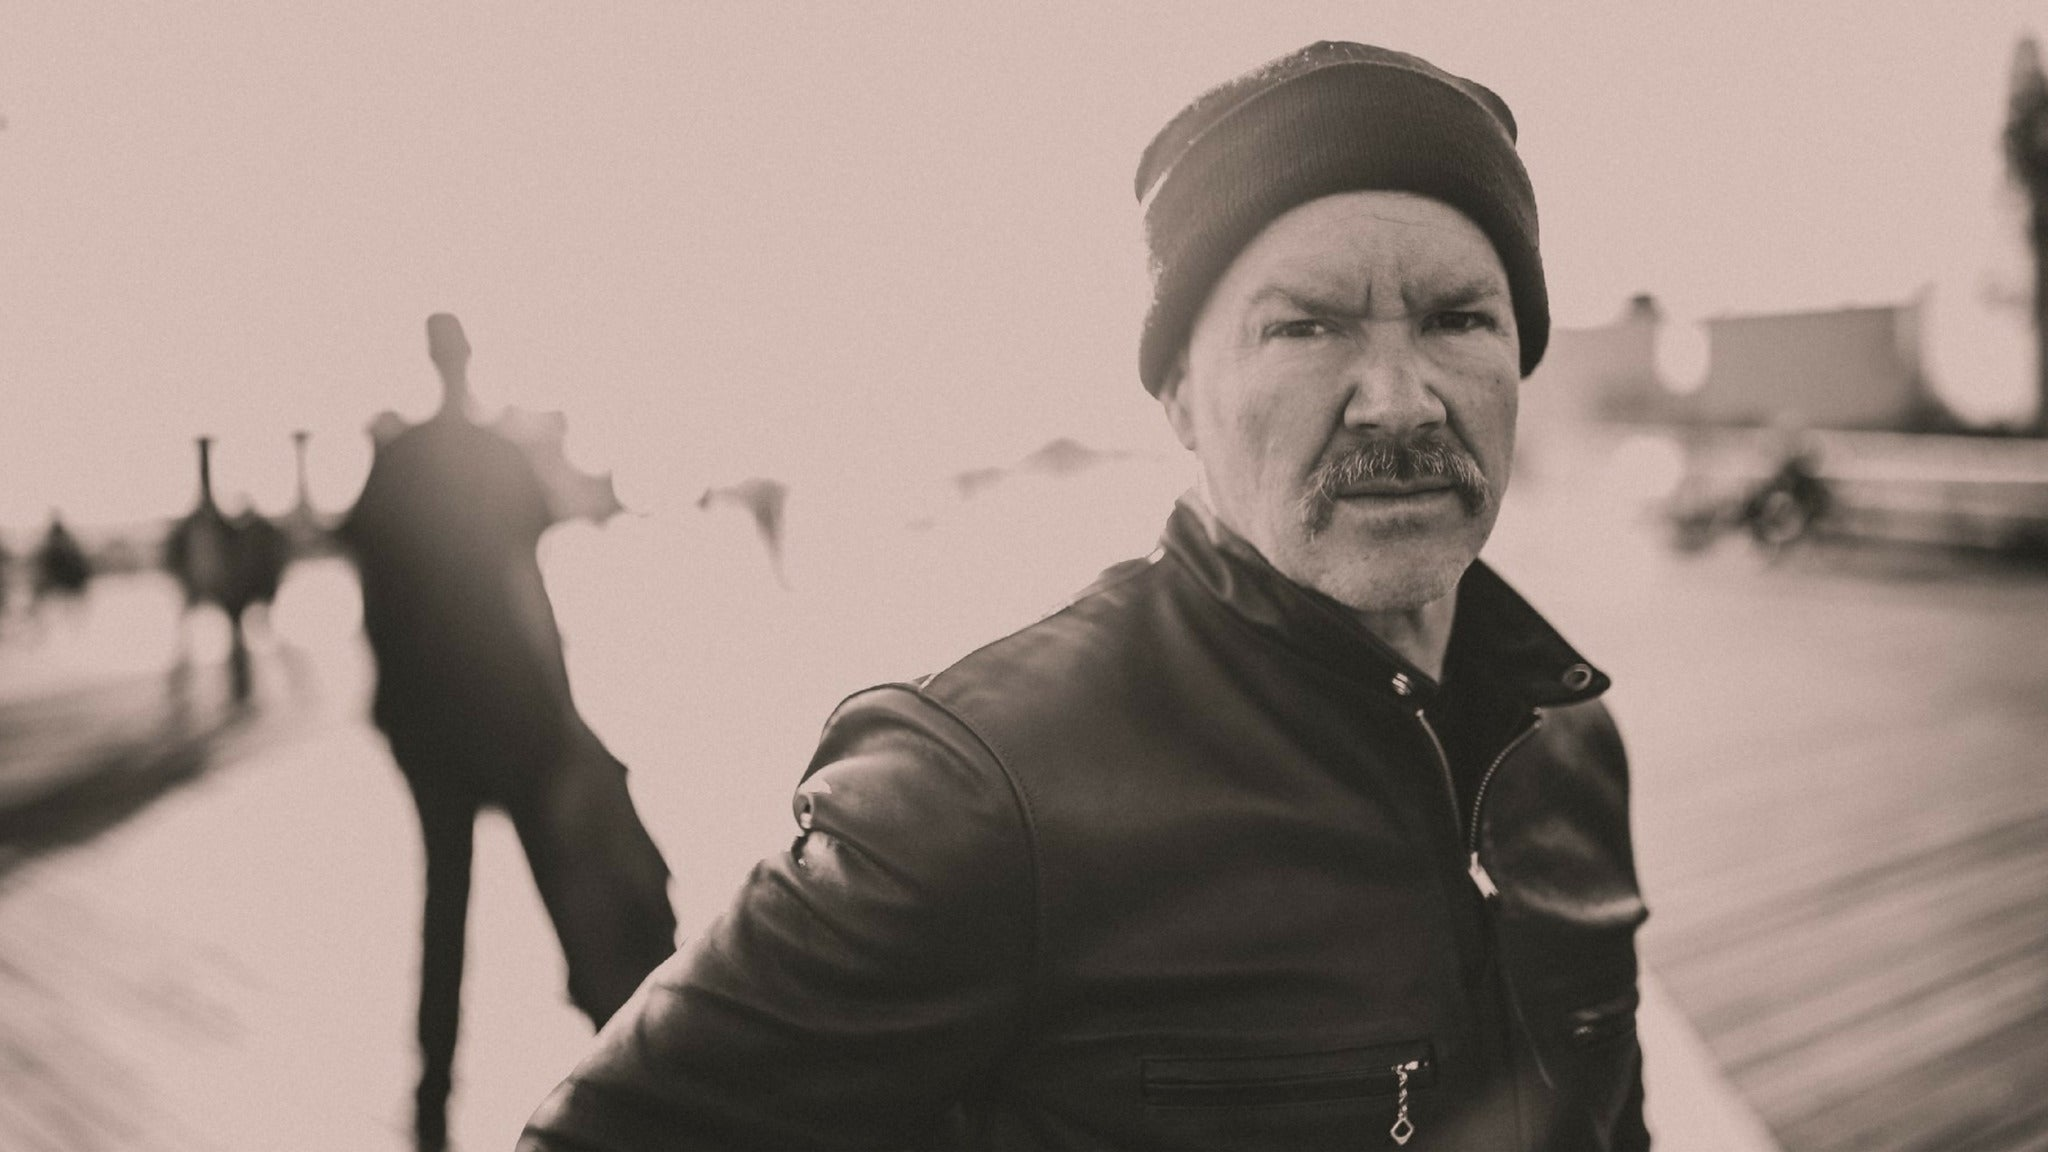 Dean Delray at Punch Line Comedy Club - San Francisco